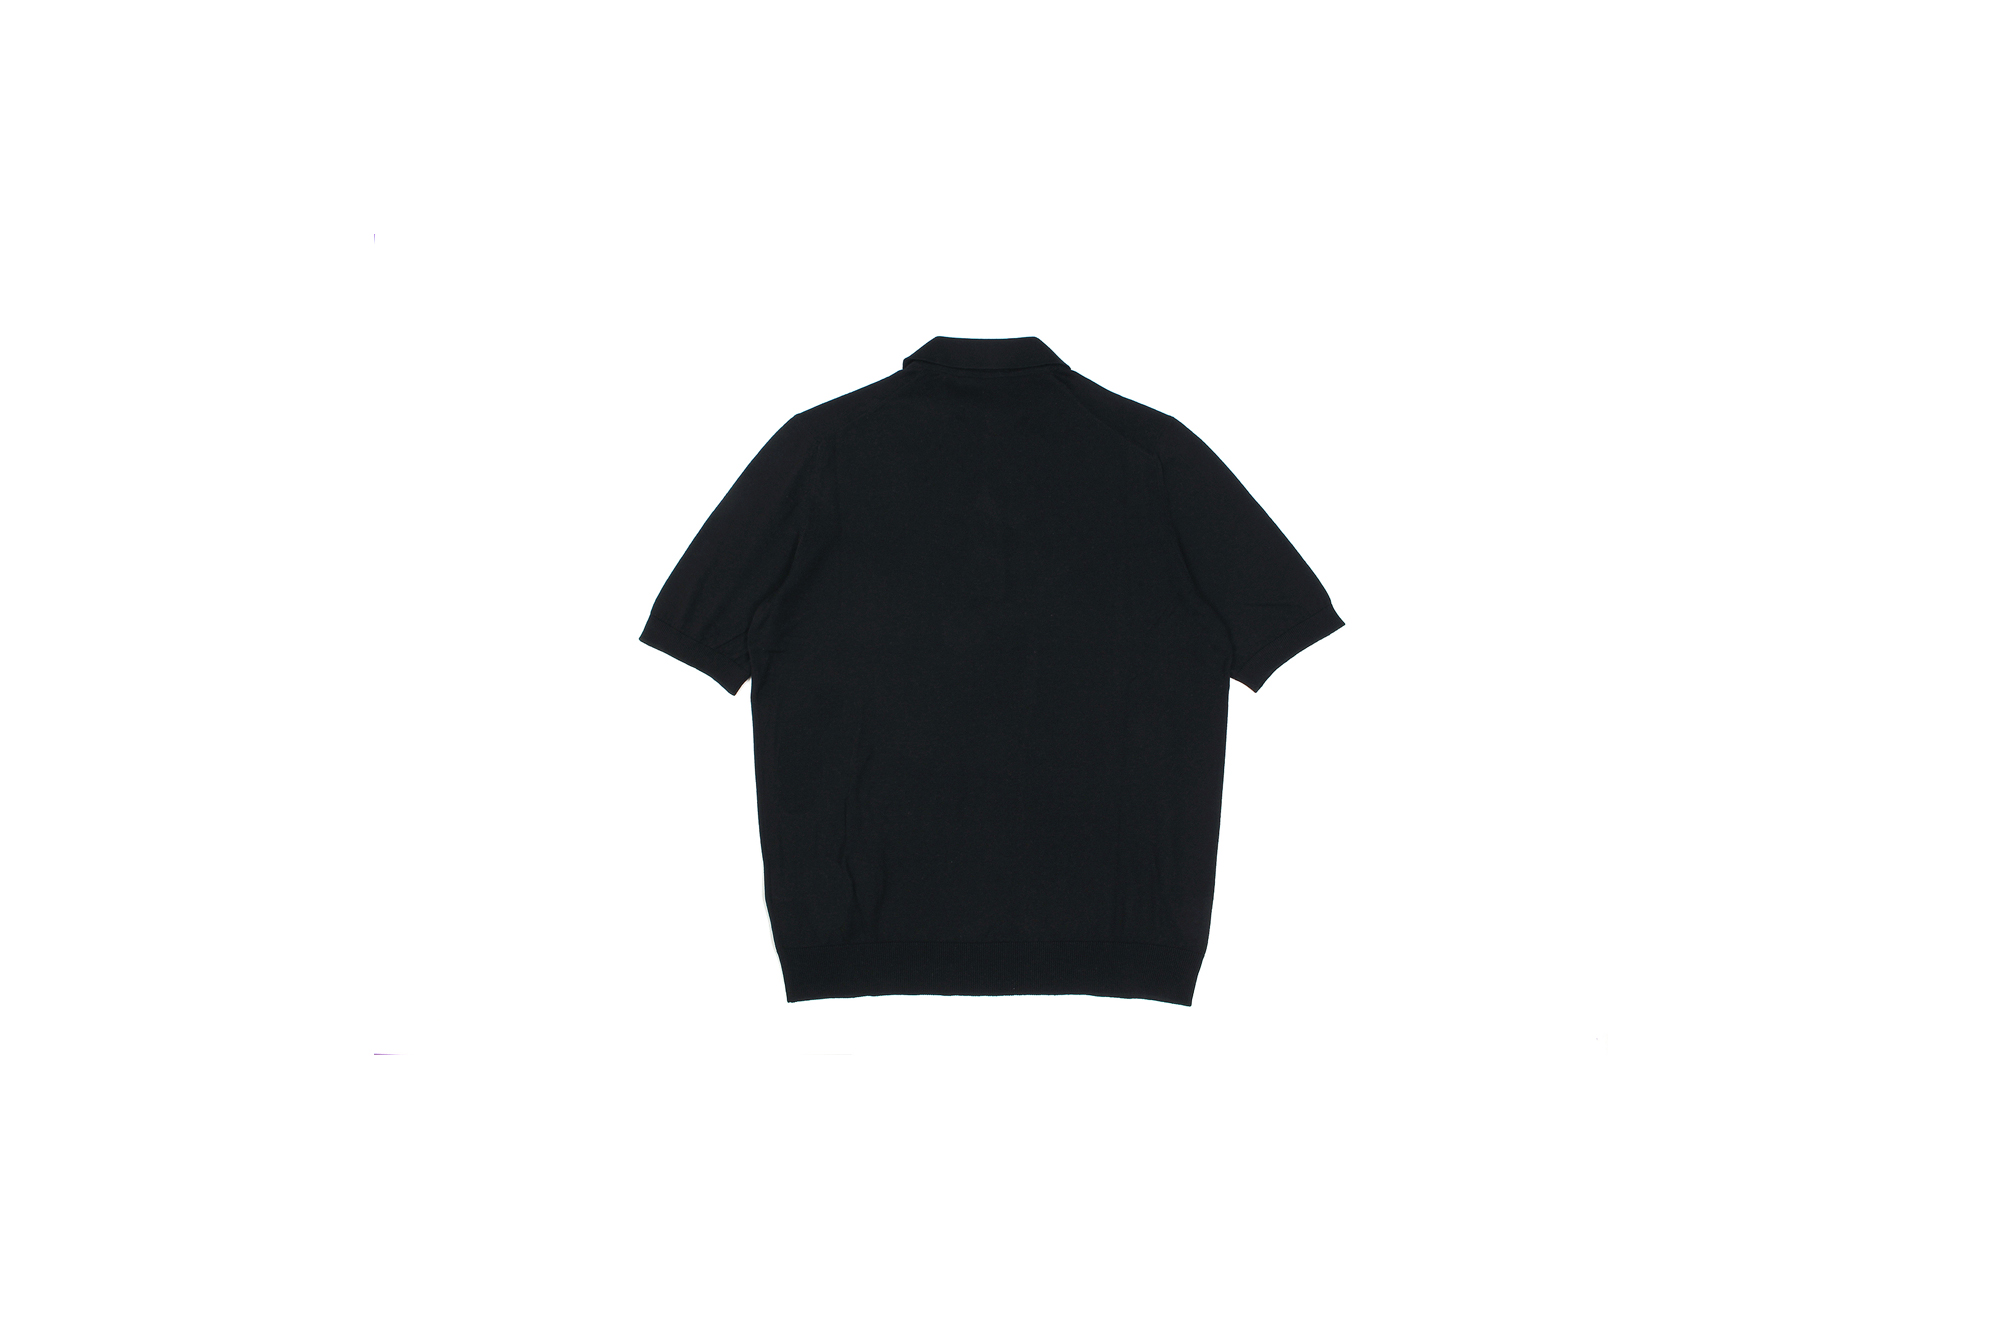 Gran Sasso (グランサッソ) Silk Knit Polo Shirt (シルクニットポロシャツ) SETA (シルク 100%) シルク ニット ポロシャツ BLACK (ブラック・099) made in italy (イタリア製) 2020 春夏新作 【入荷しました】【フリー分発売開始】 愛知 名古屋 altoediritto アルトエデリット